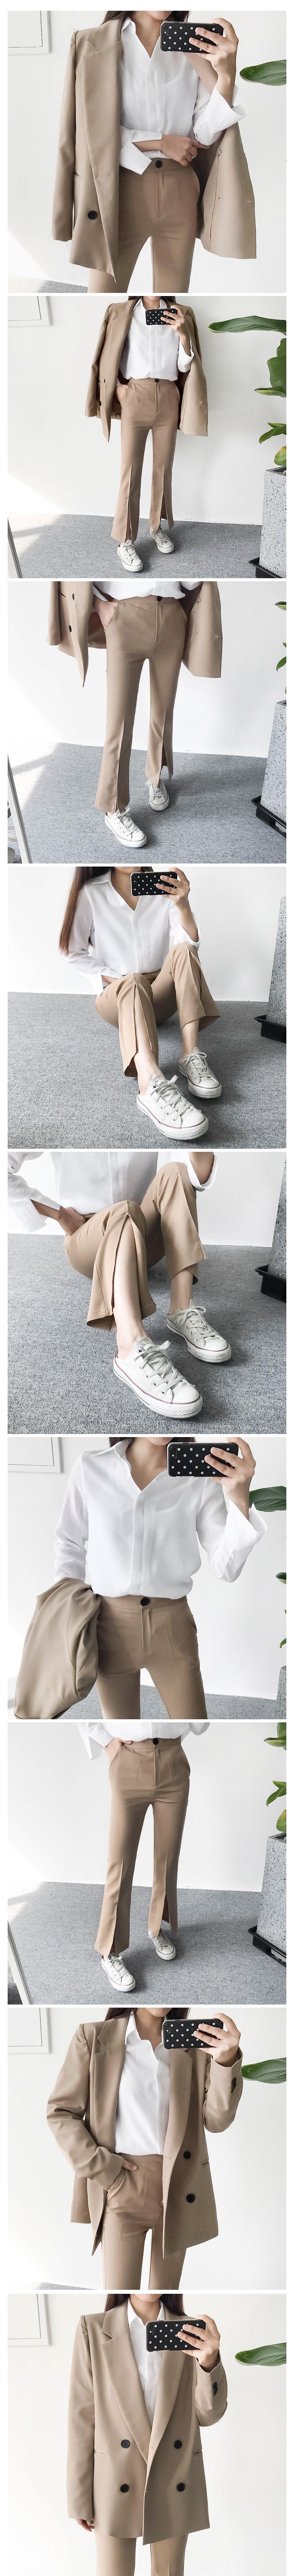 Boy Boots Cut Lim Slacks